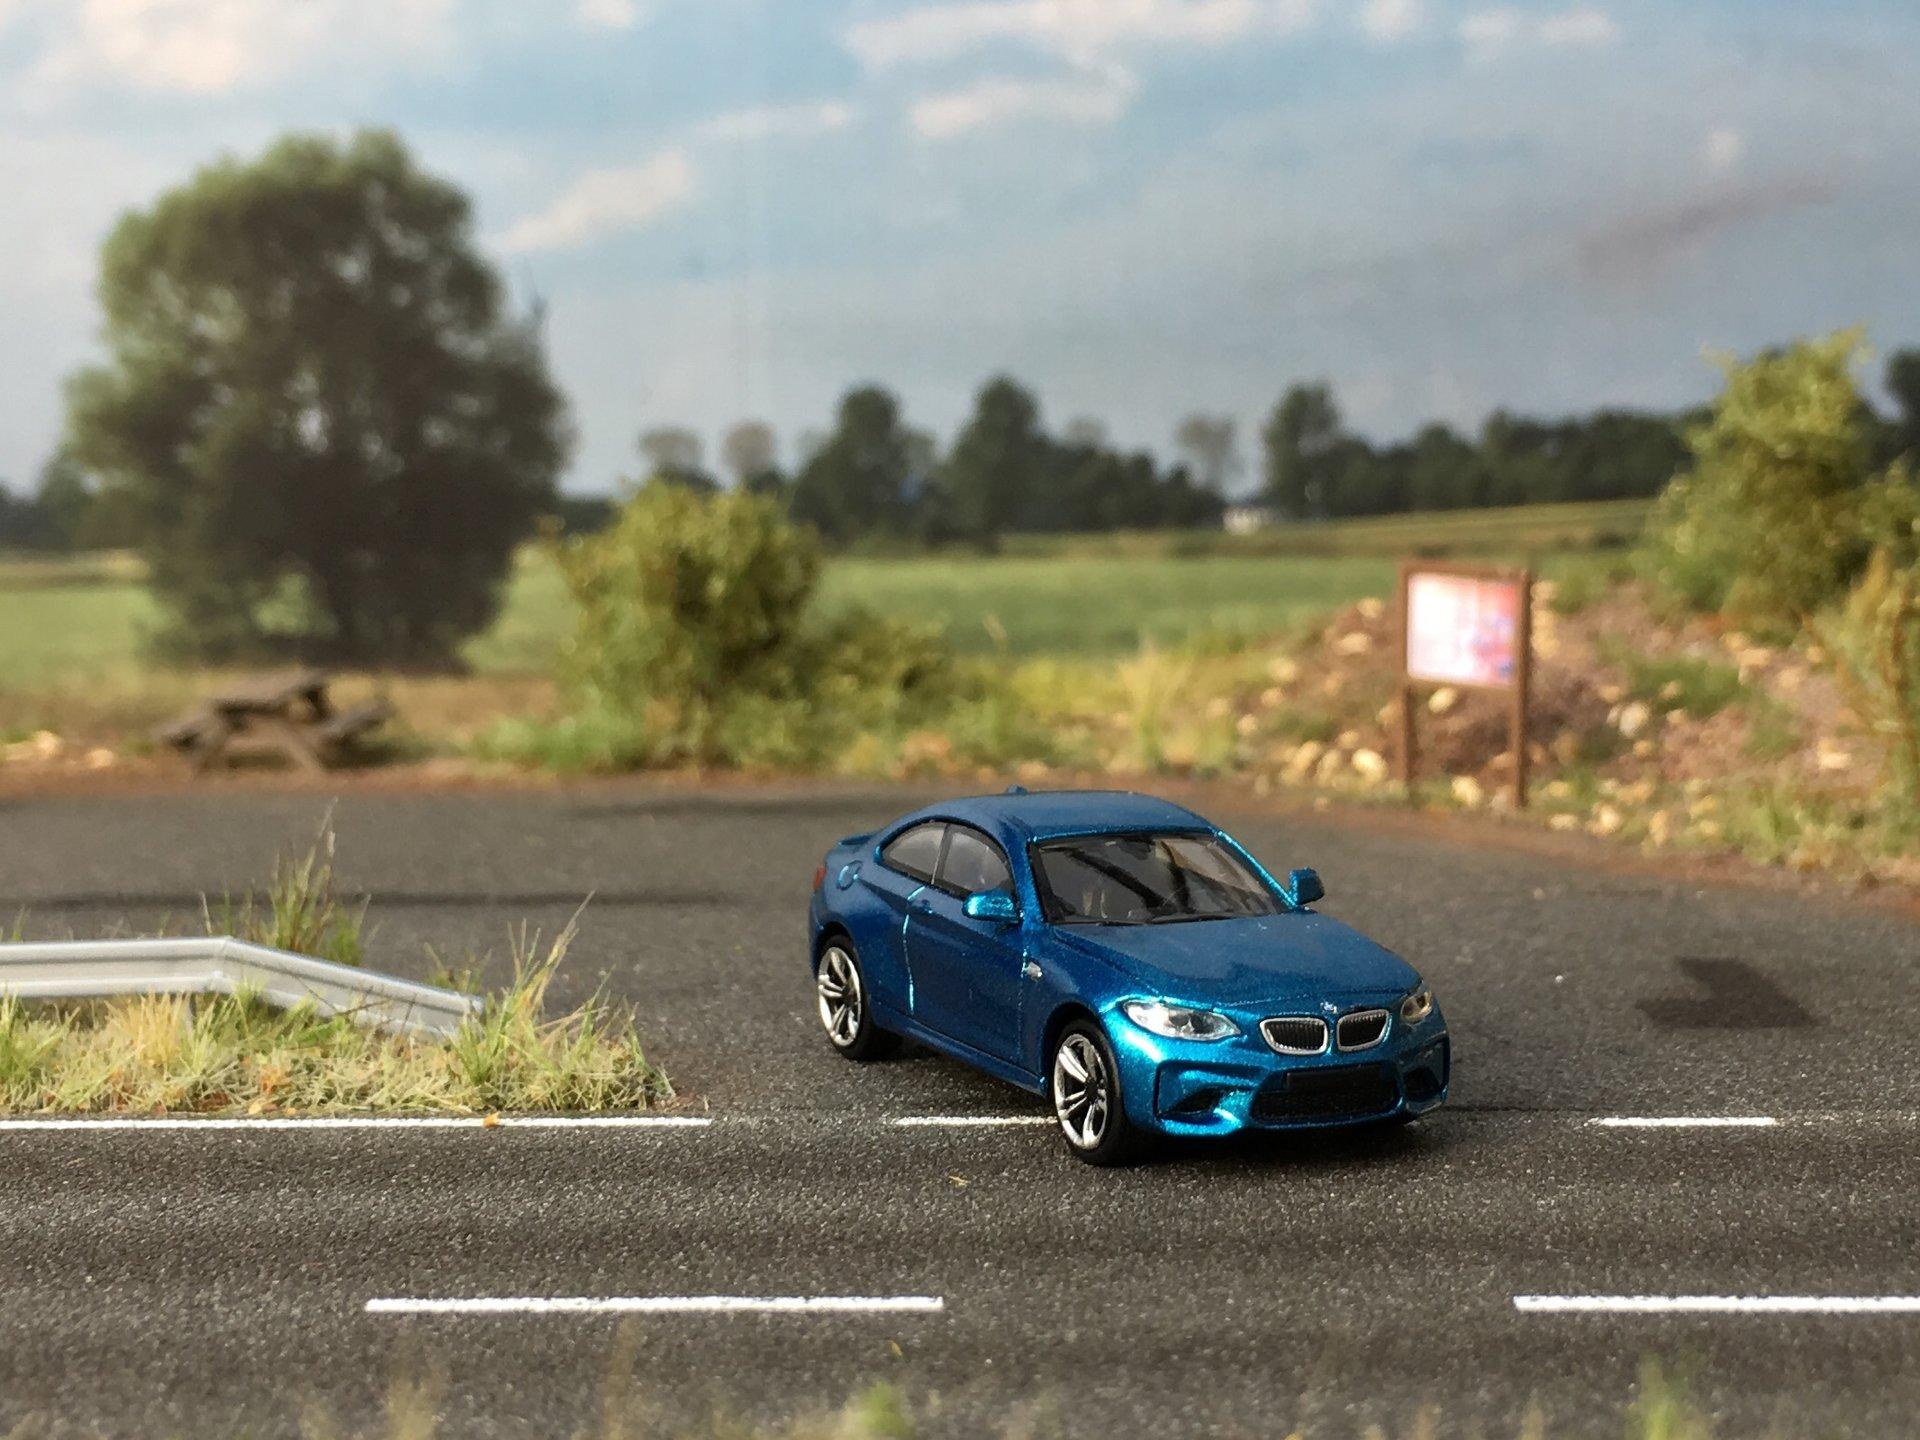 BMW M2 002.jpg